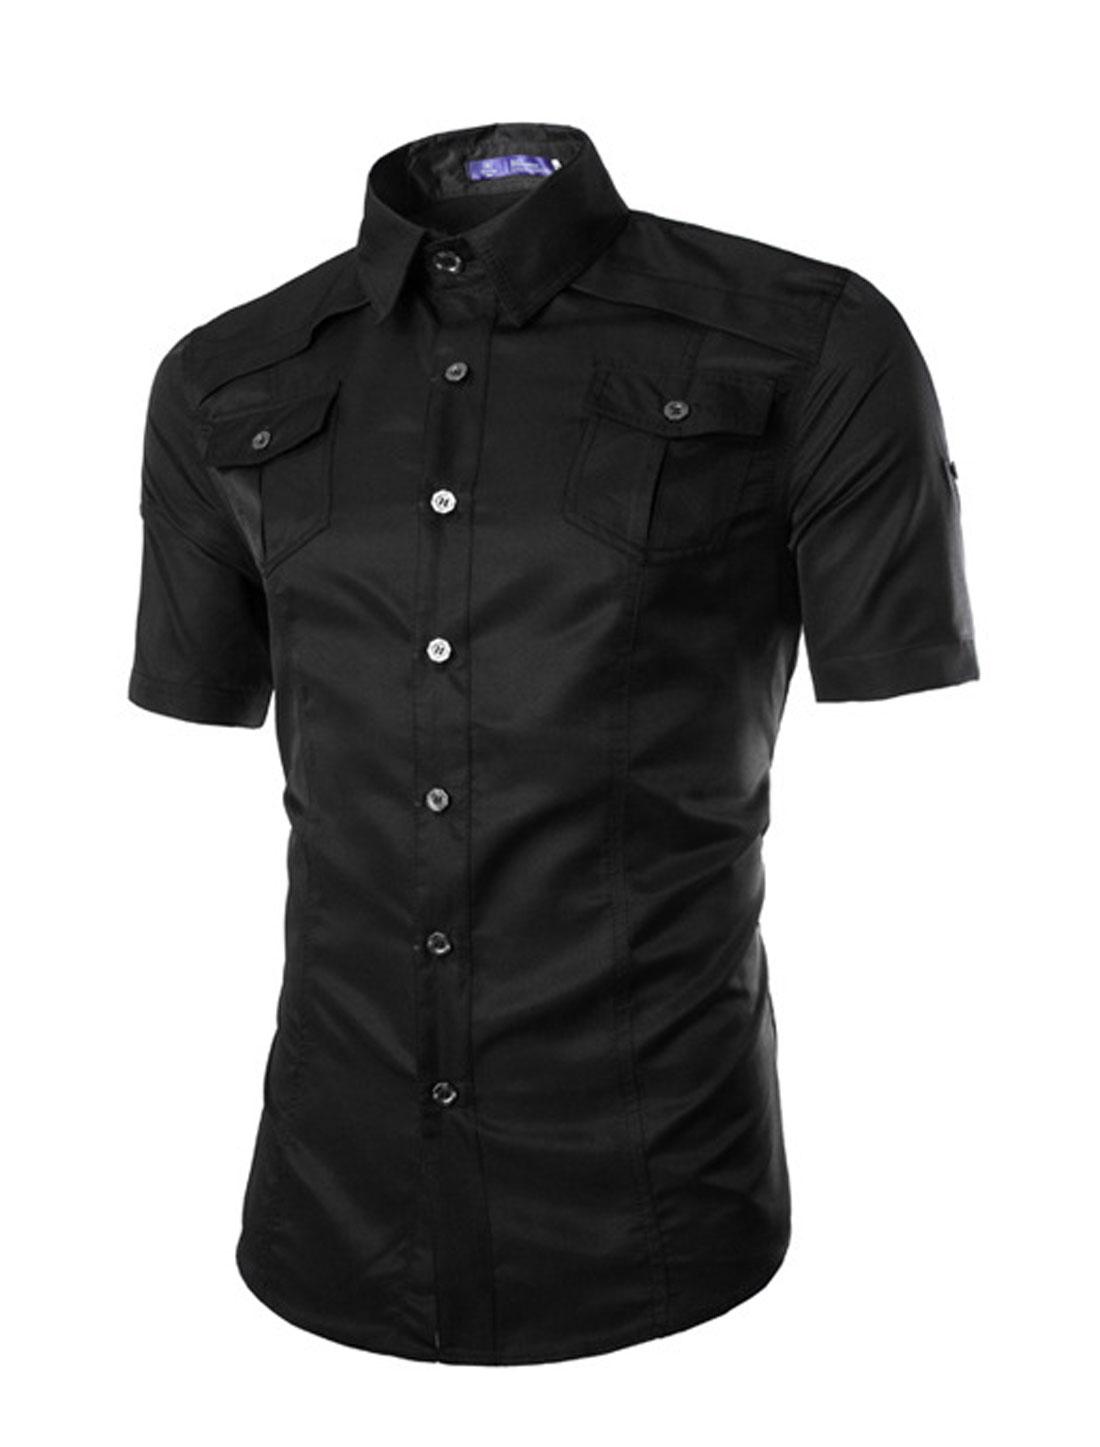 Men Point Collar Short Sleeves Flap Pockets Casual Shirts Black M